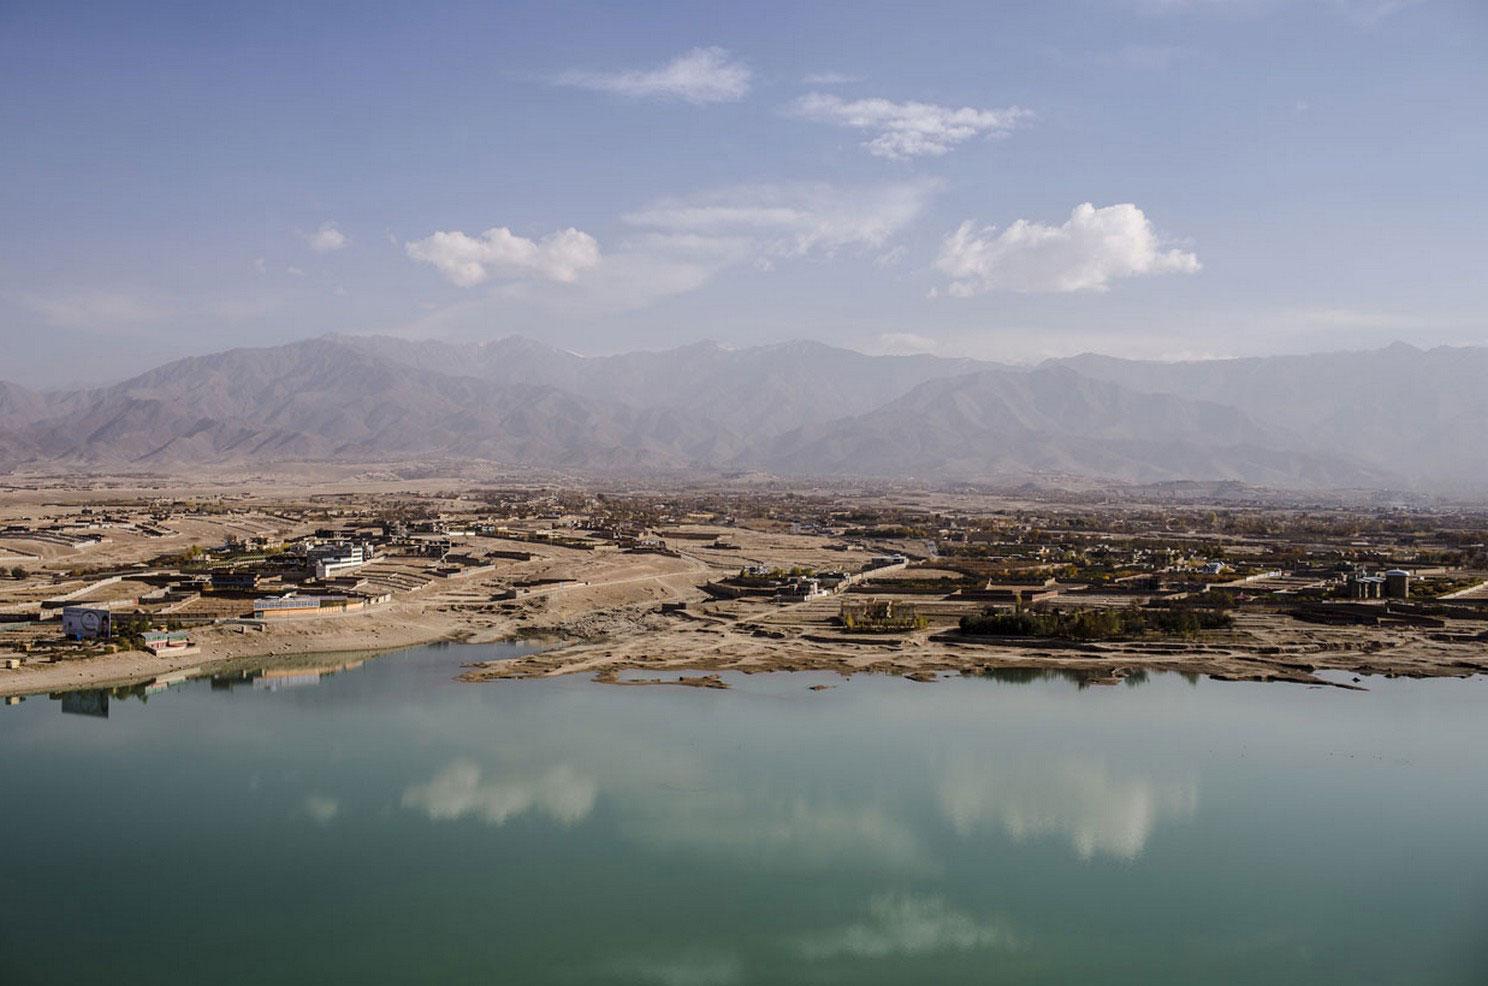 озеро Афганистана, захваченное талибами